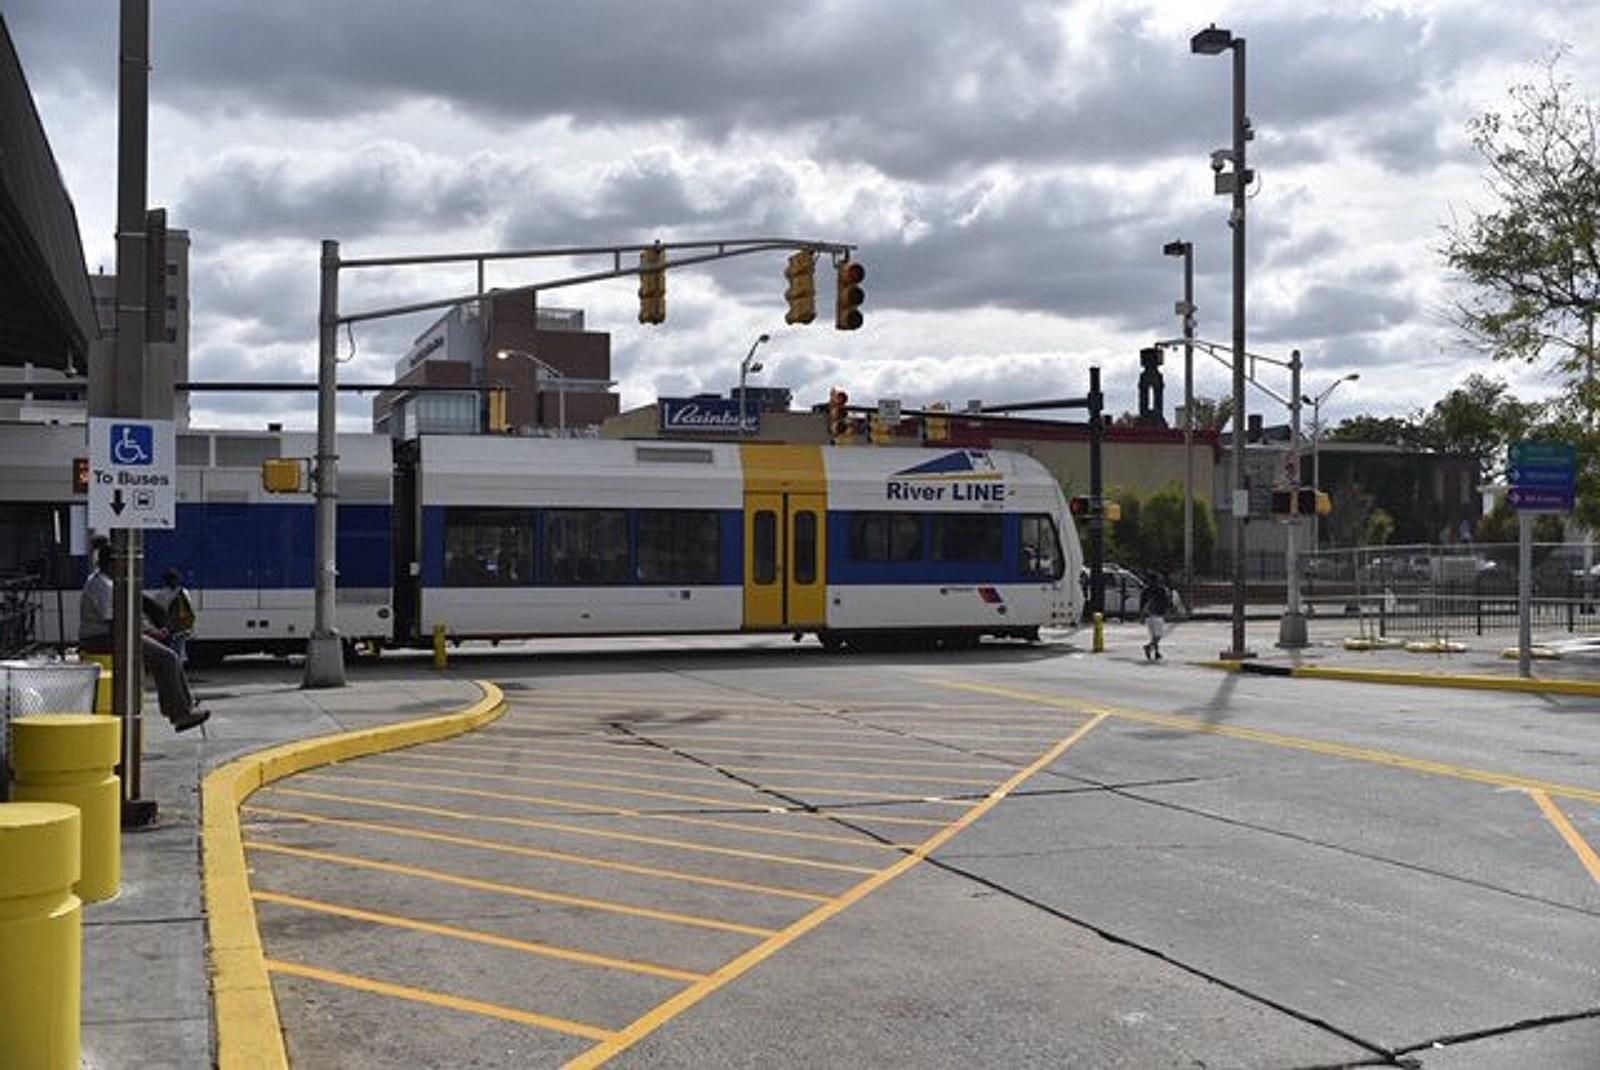 Nj Transit River Line Back In Service On Monday